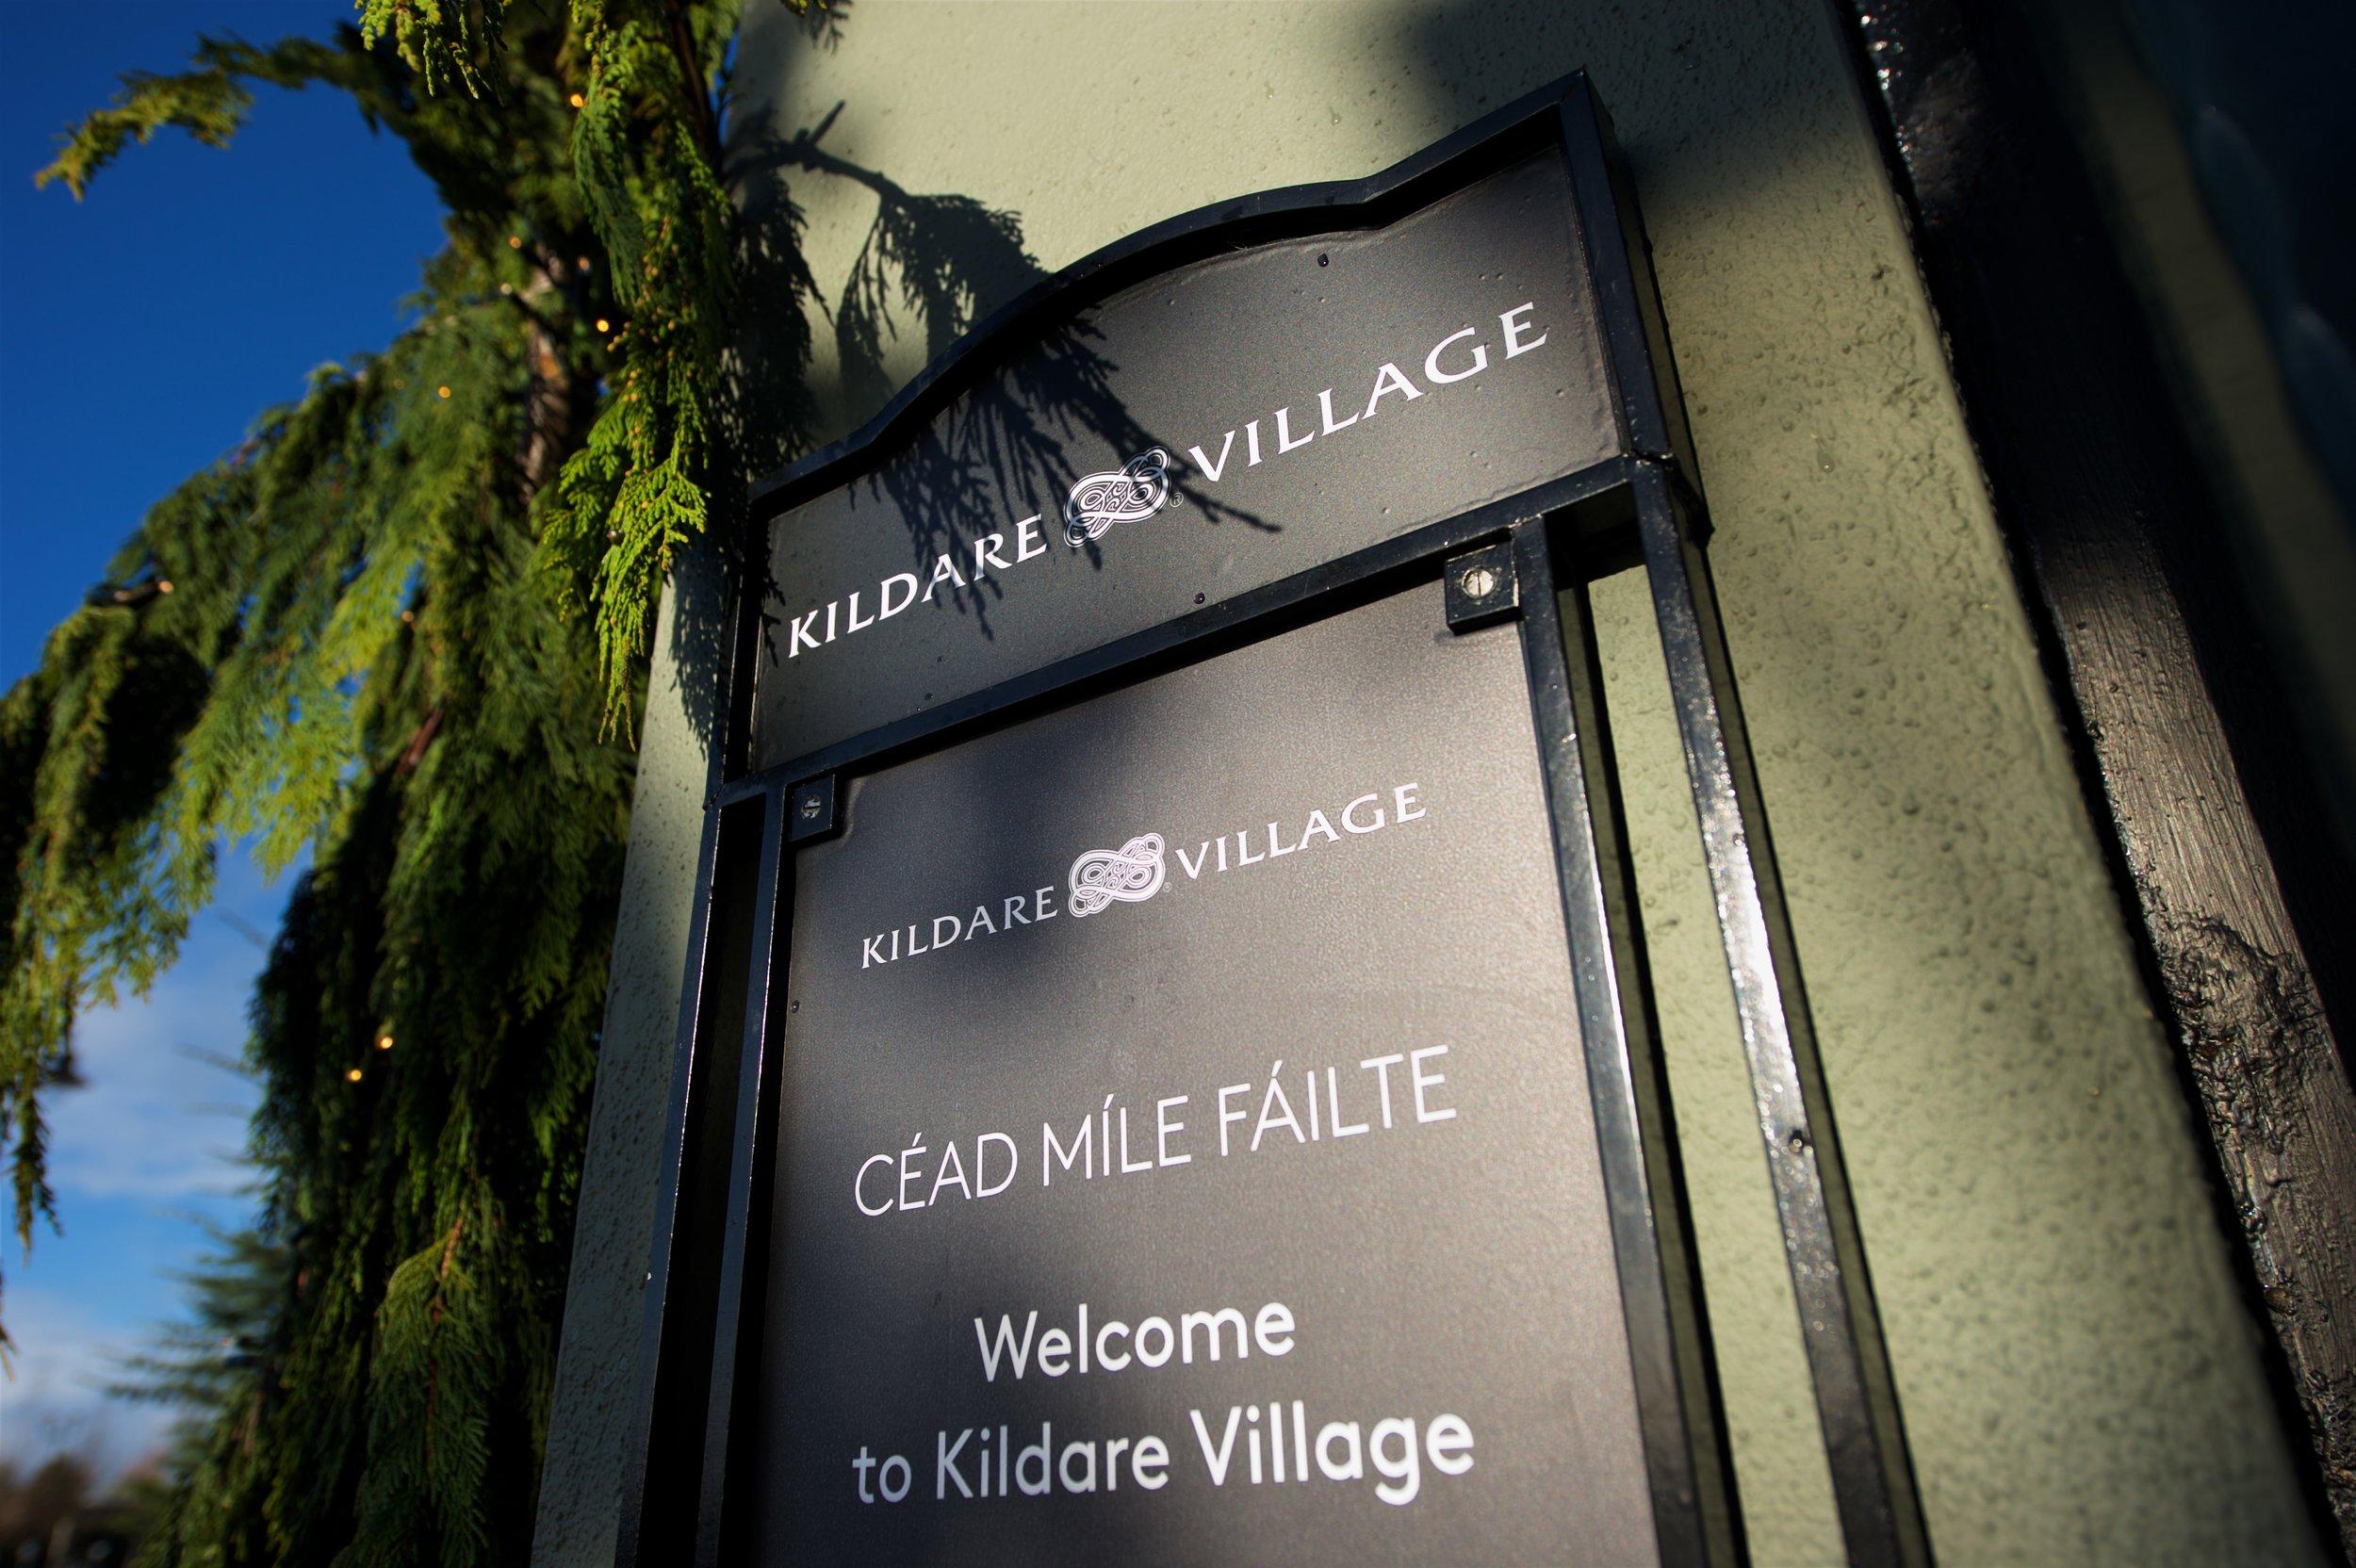 056 Alpha Mechanical PUMA Kildare Village.jpg